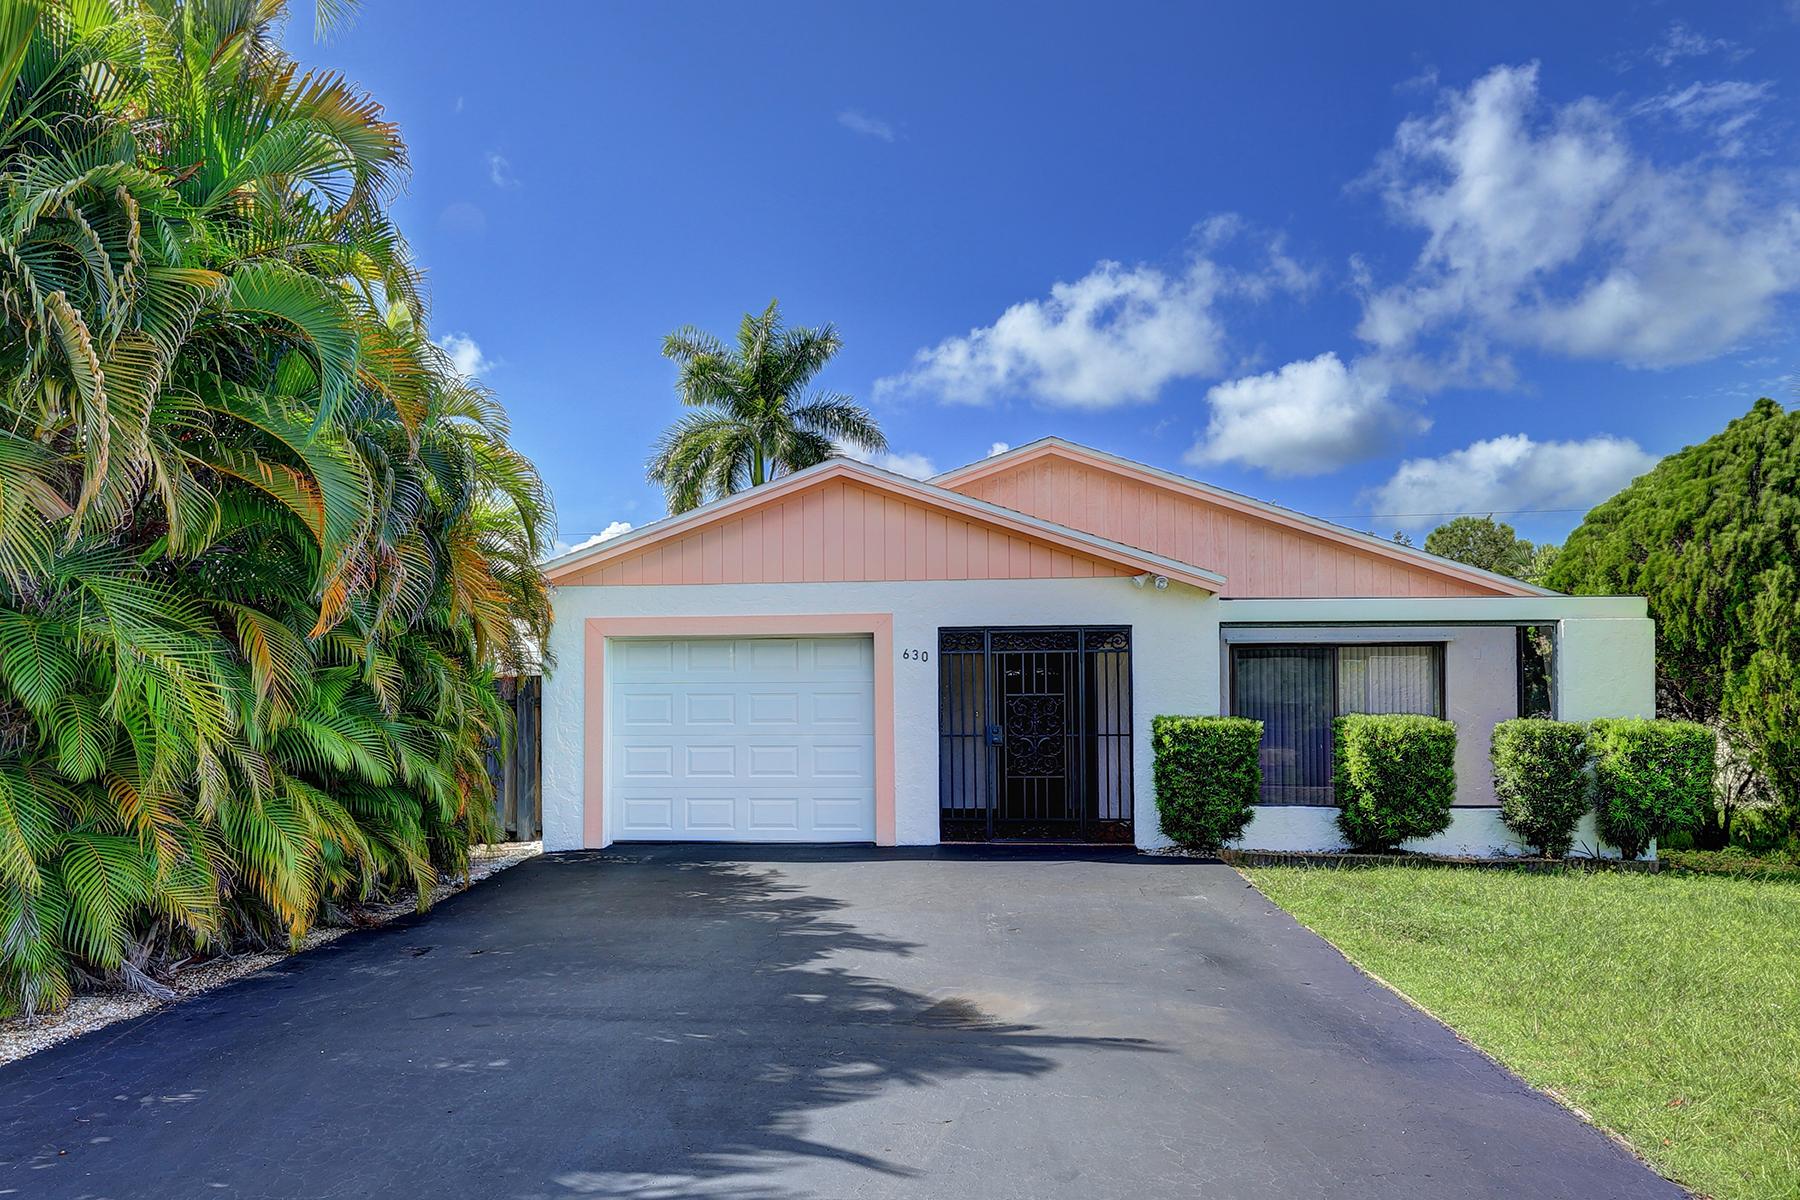 Villa per Vendita alle ore NAPLES PARK 630 97th Ave N Naples, Florida 34108 Stati Uniti